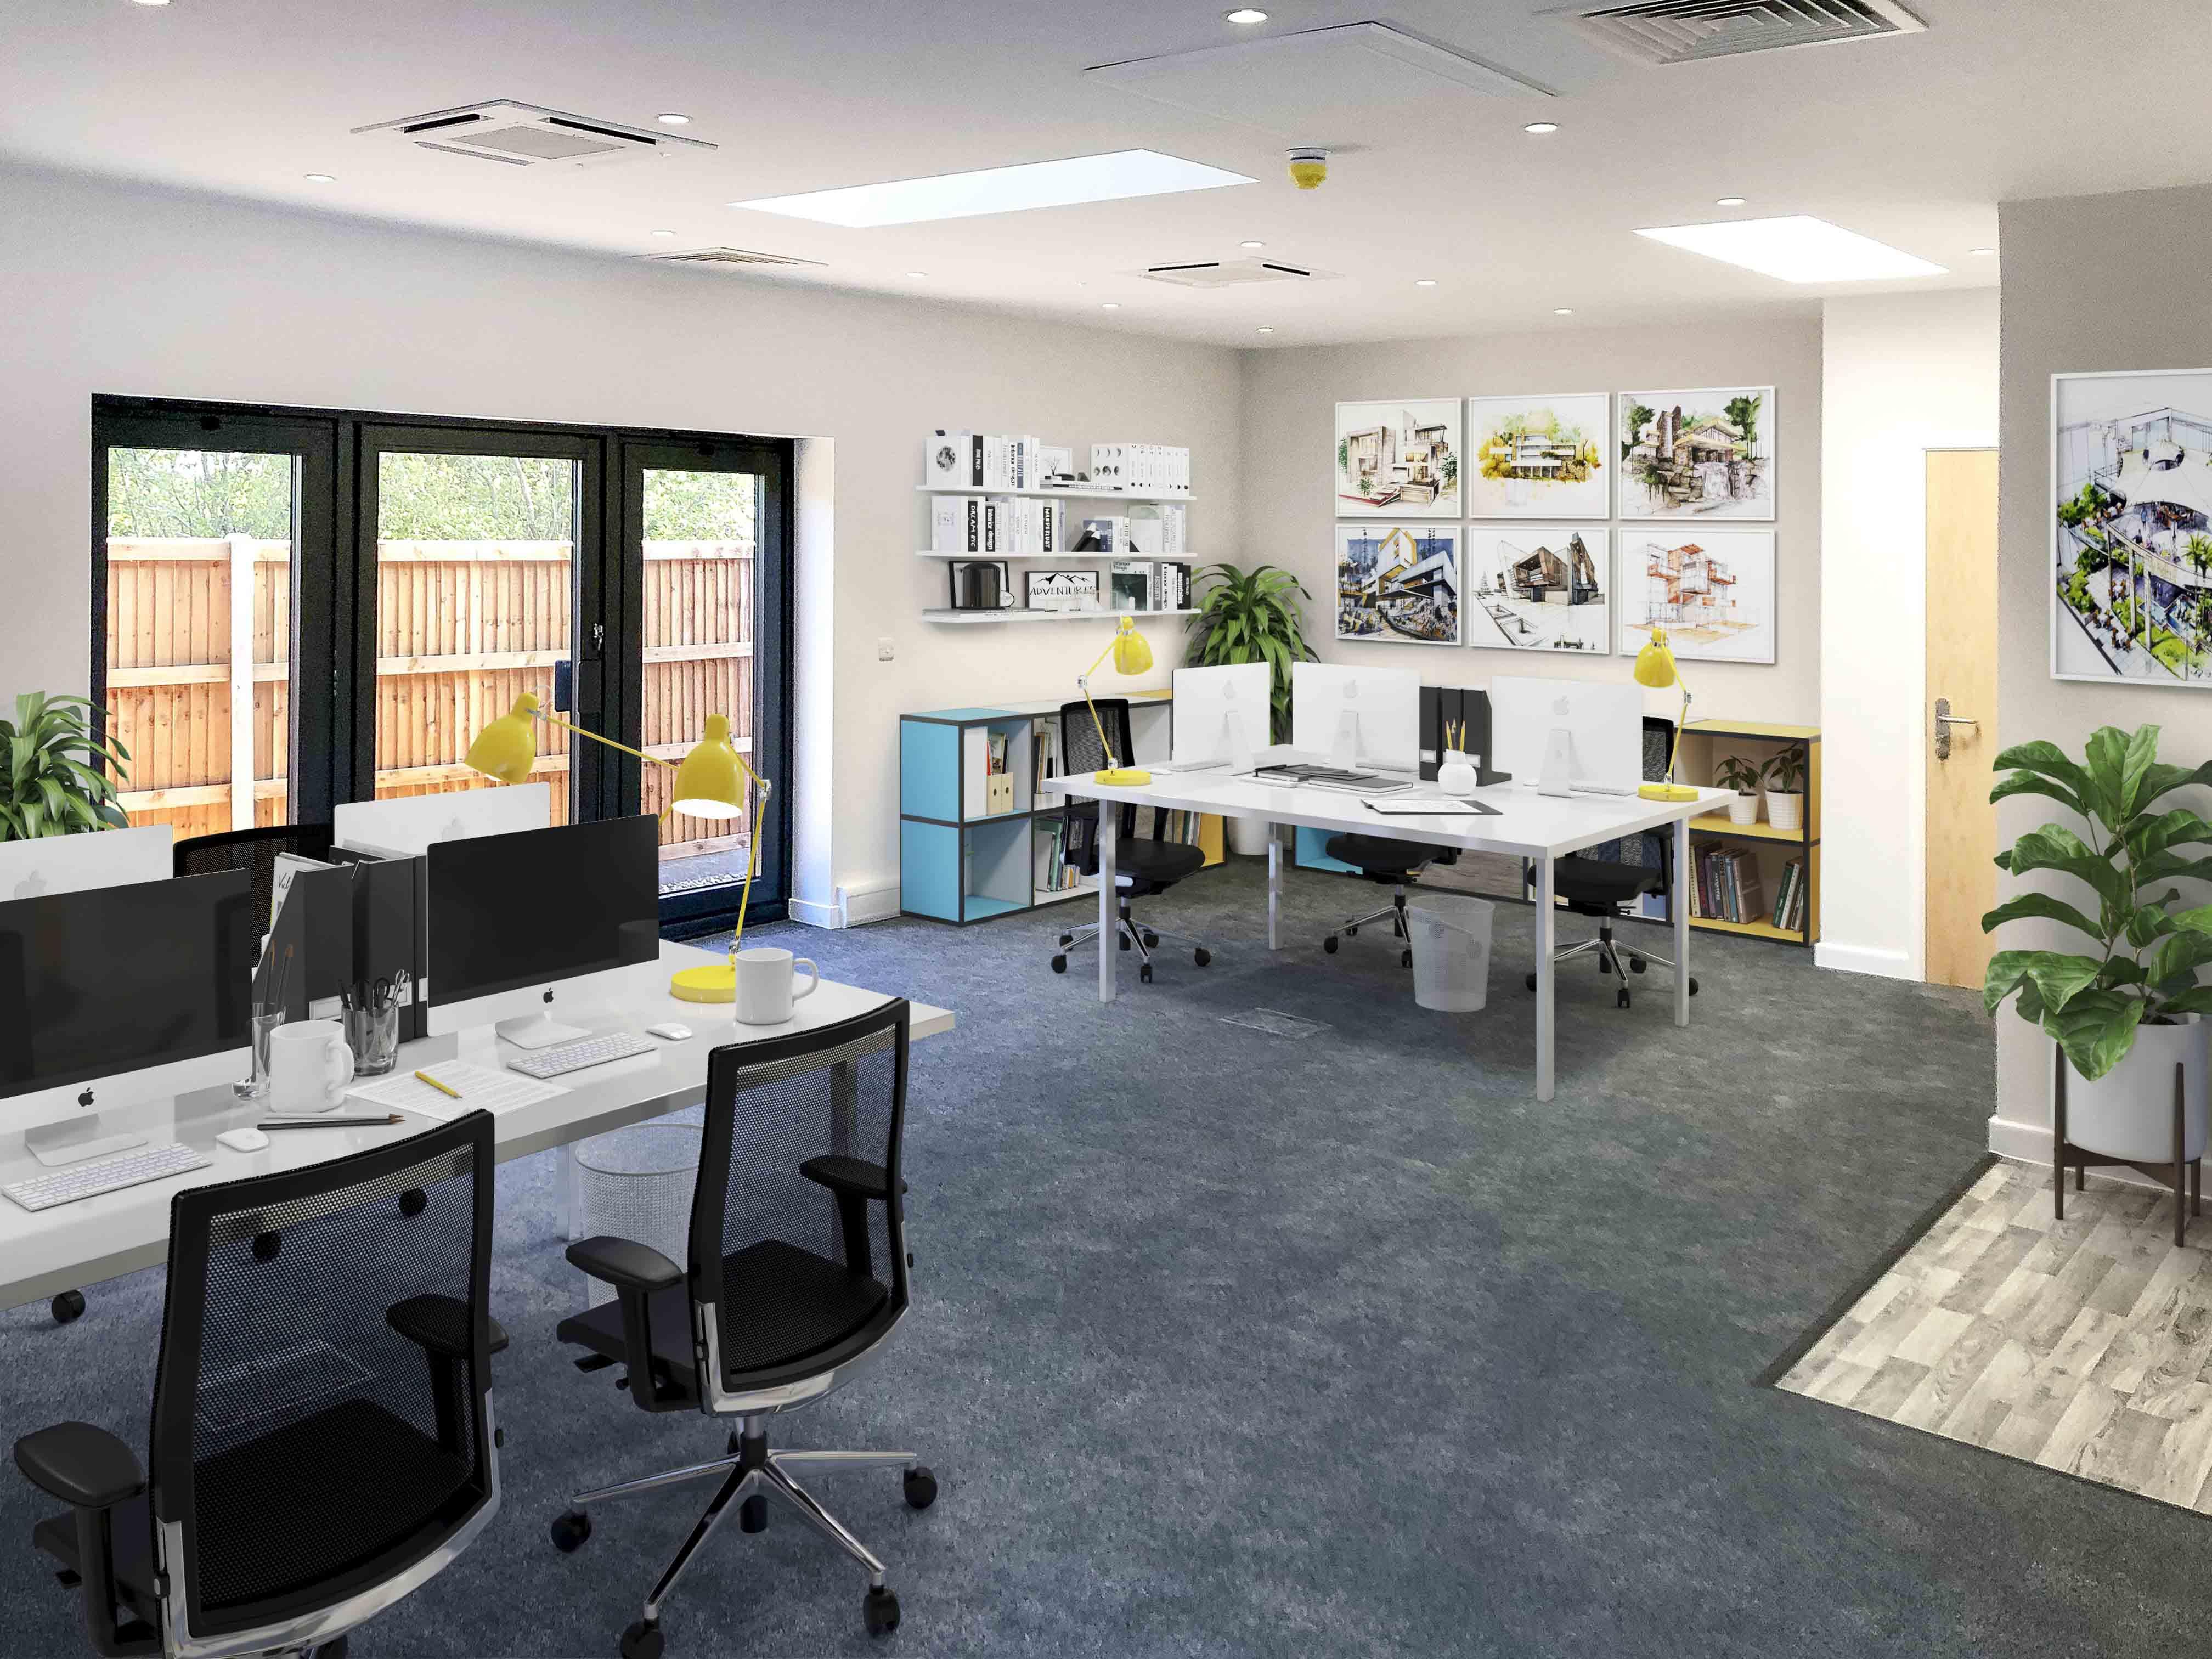 Creative & Architect spaces